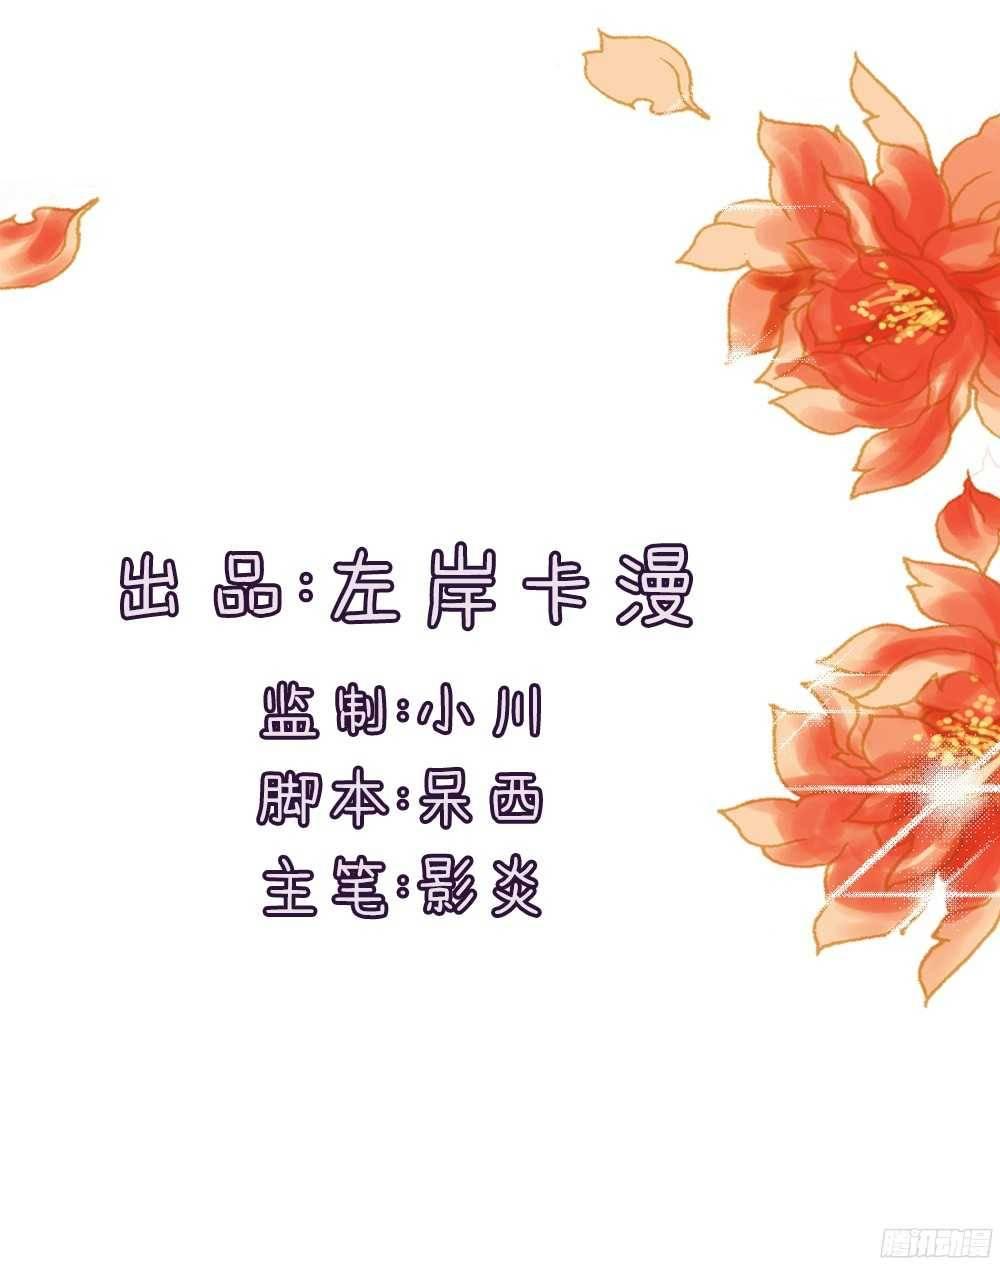 Bạn Trai Minh Tinh Bức Yêu Chap 45 - Next Chap 46